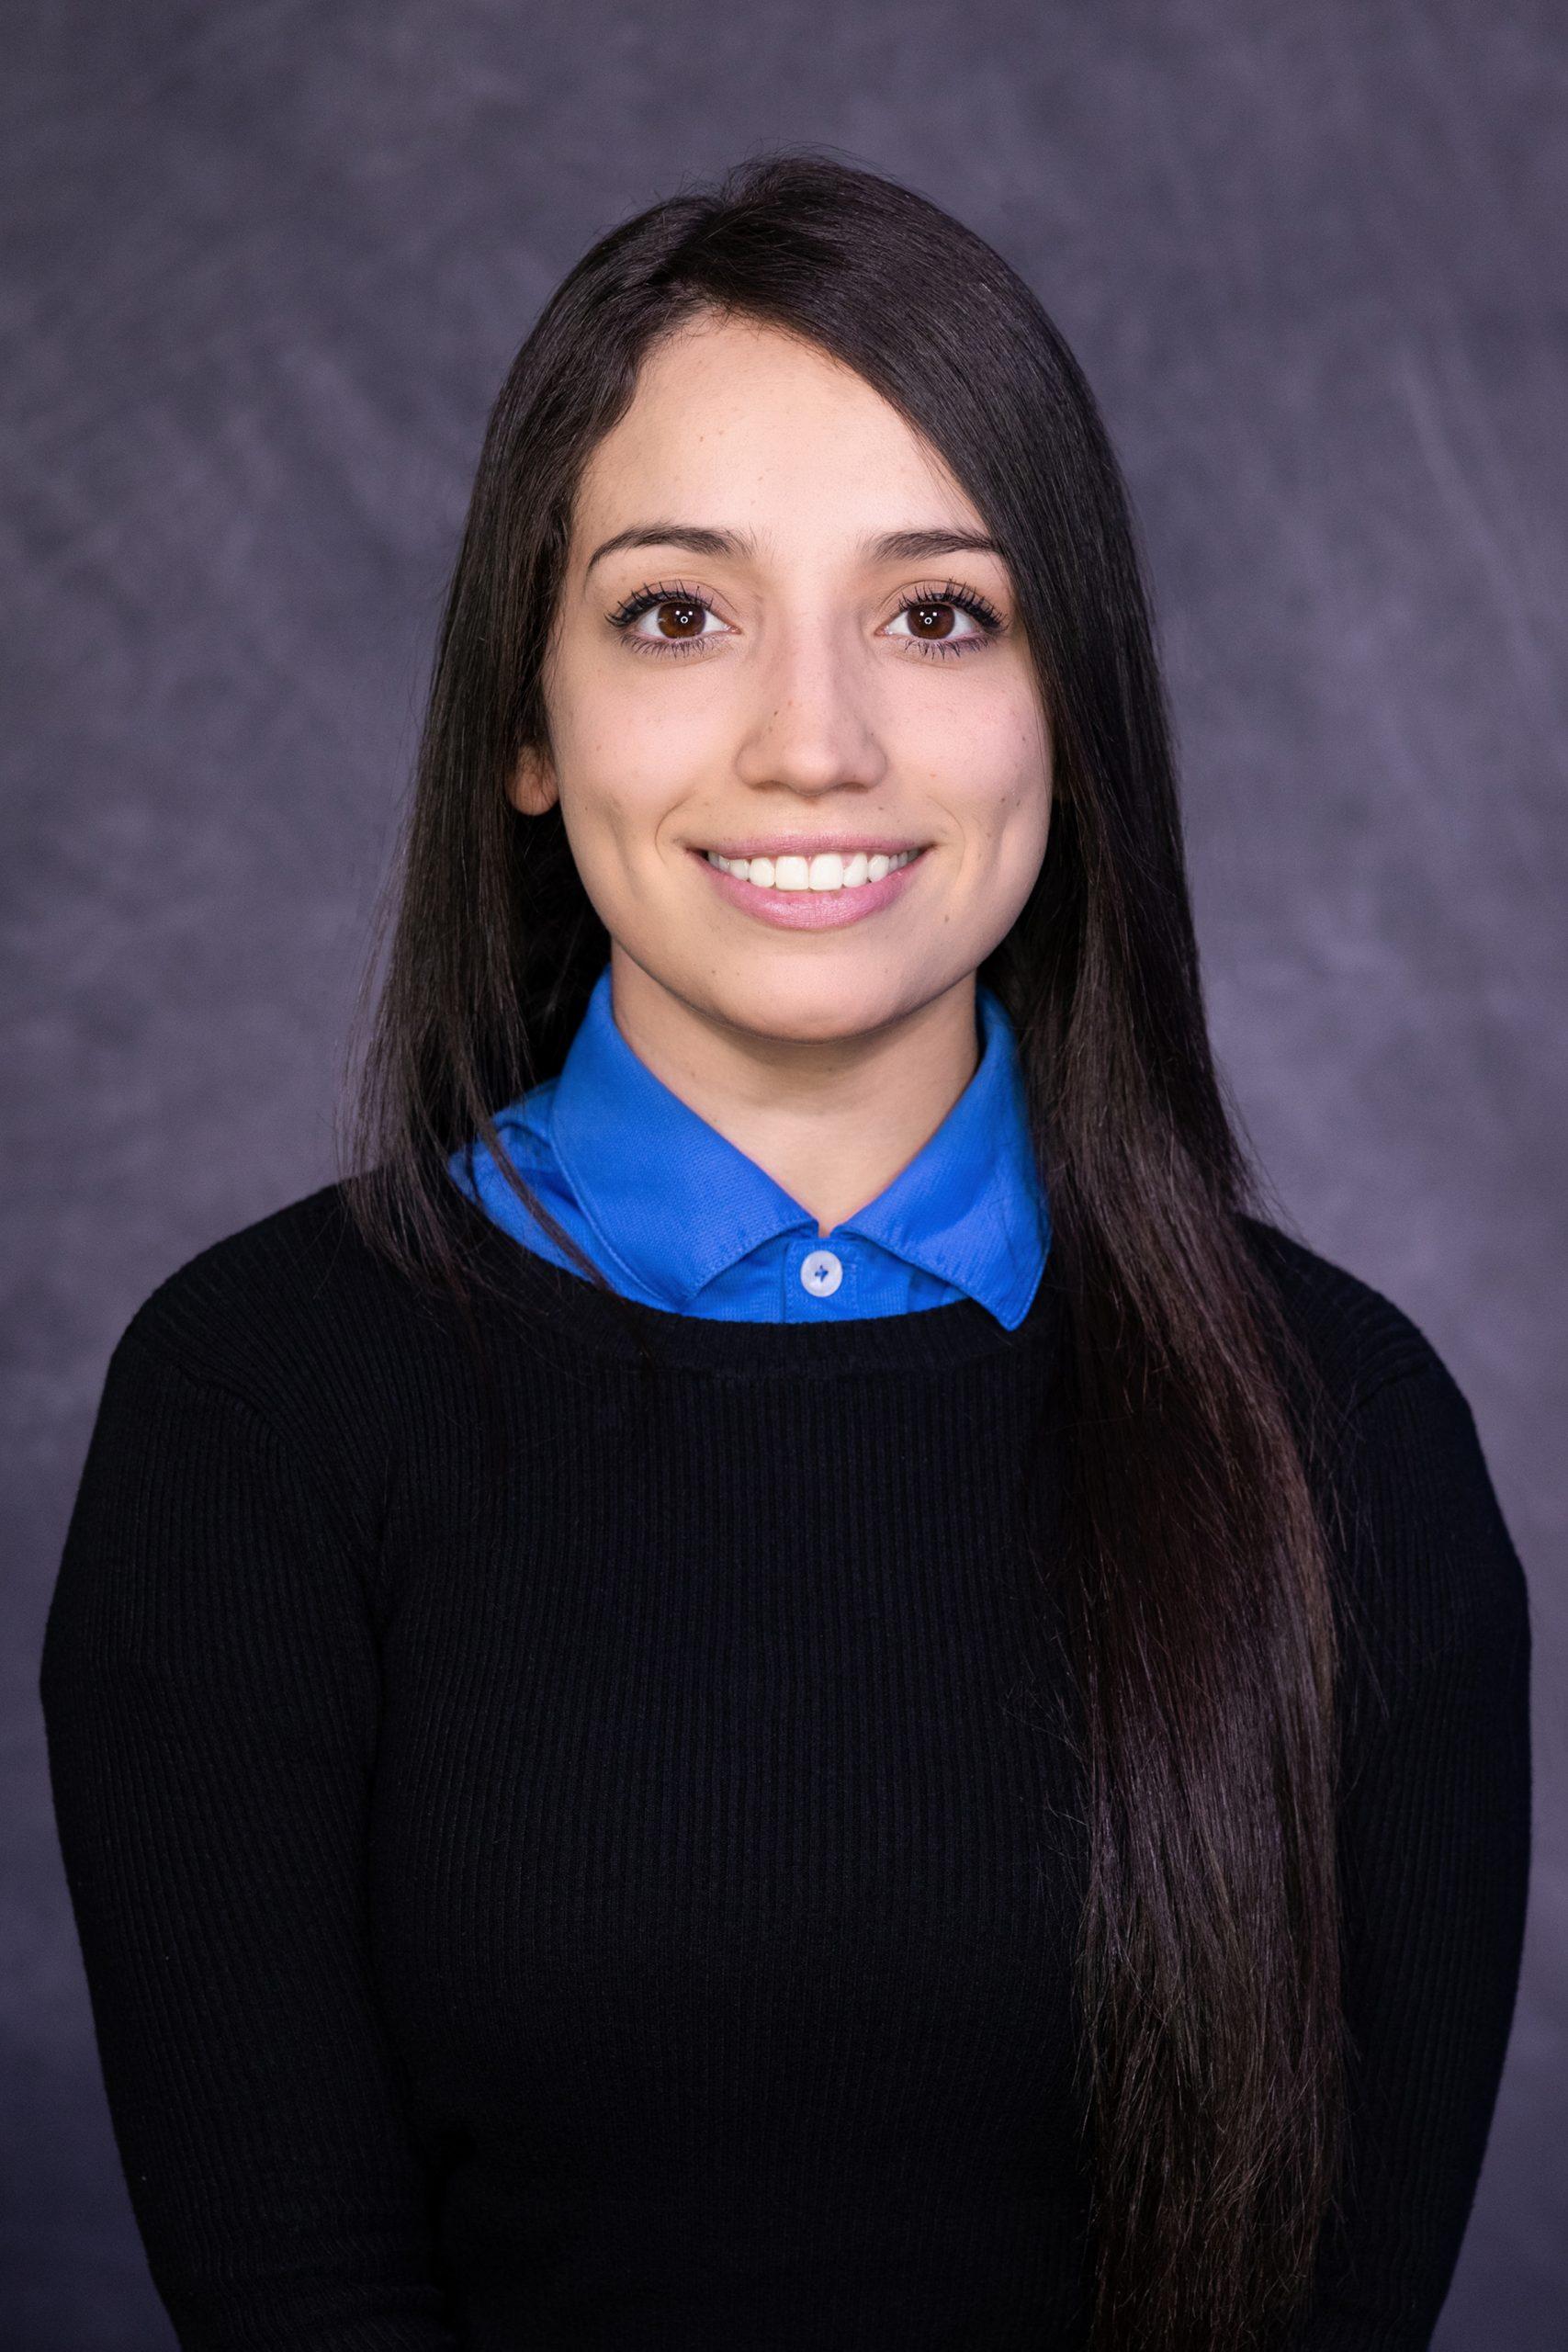 Michelle Camacho